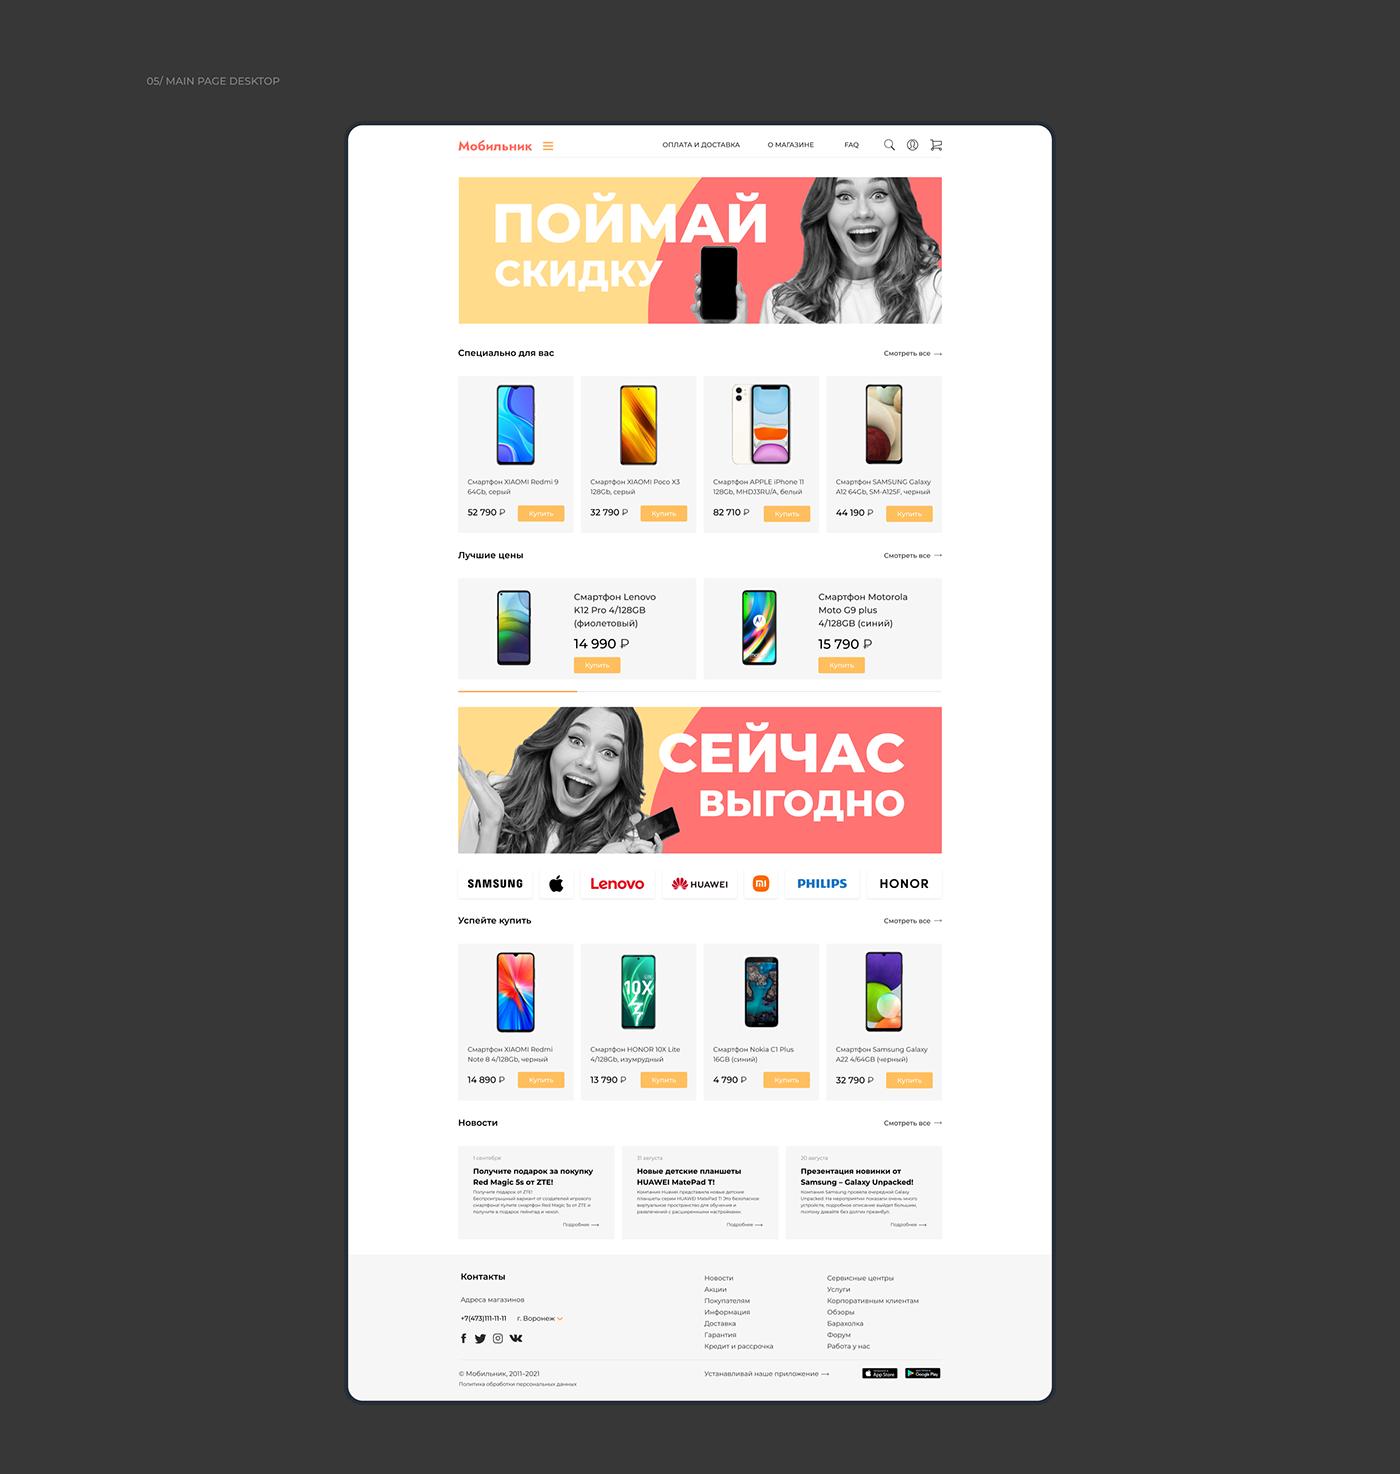 Behance e-commerce UI/UX ux Web Design  Website xD Adobe XD ui design user experience